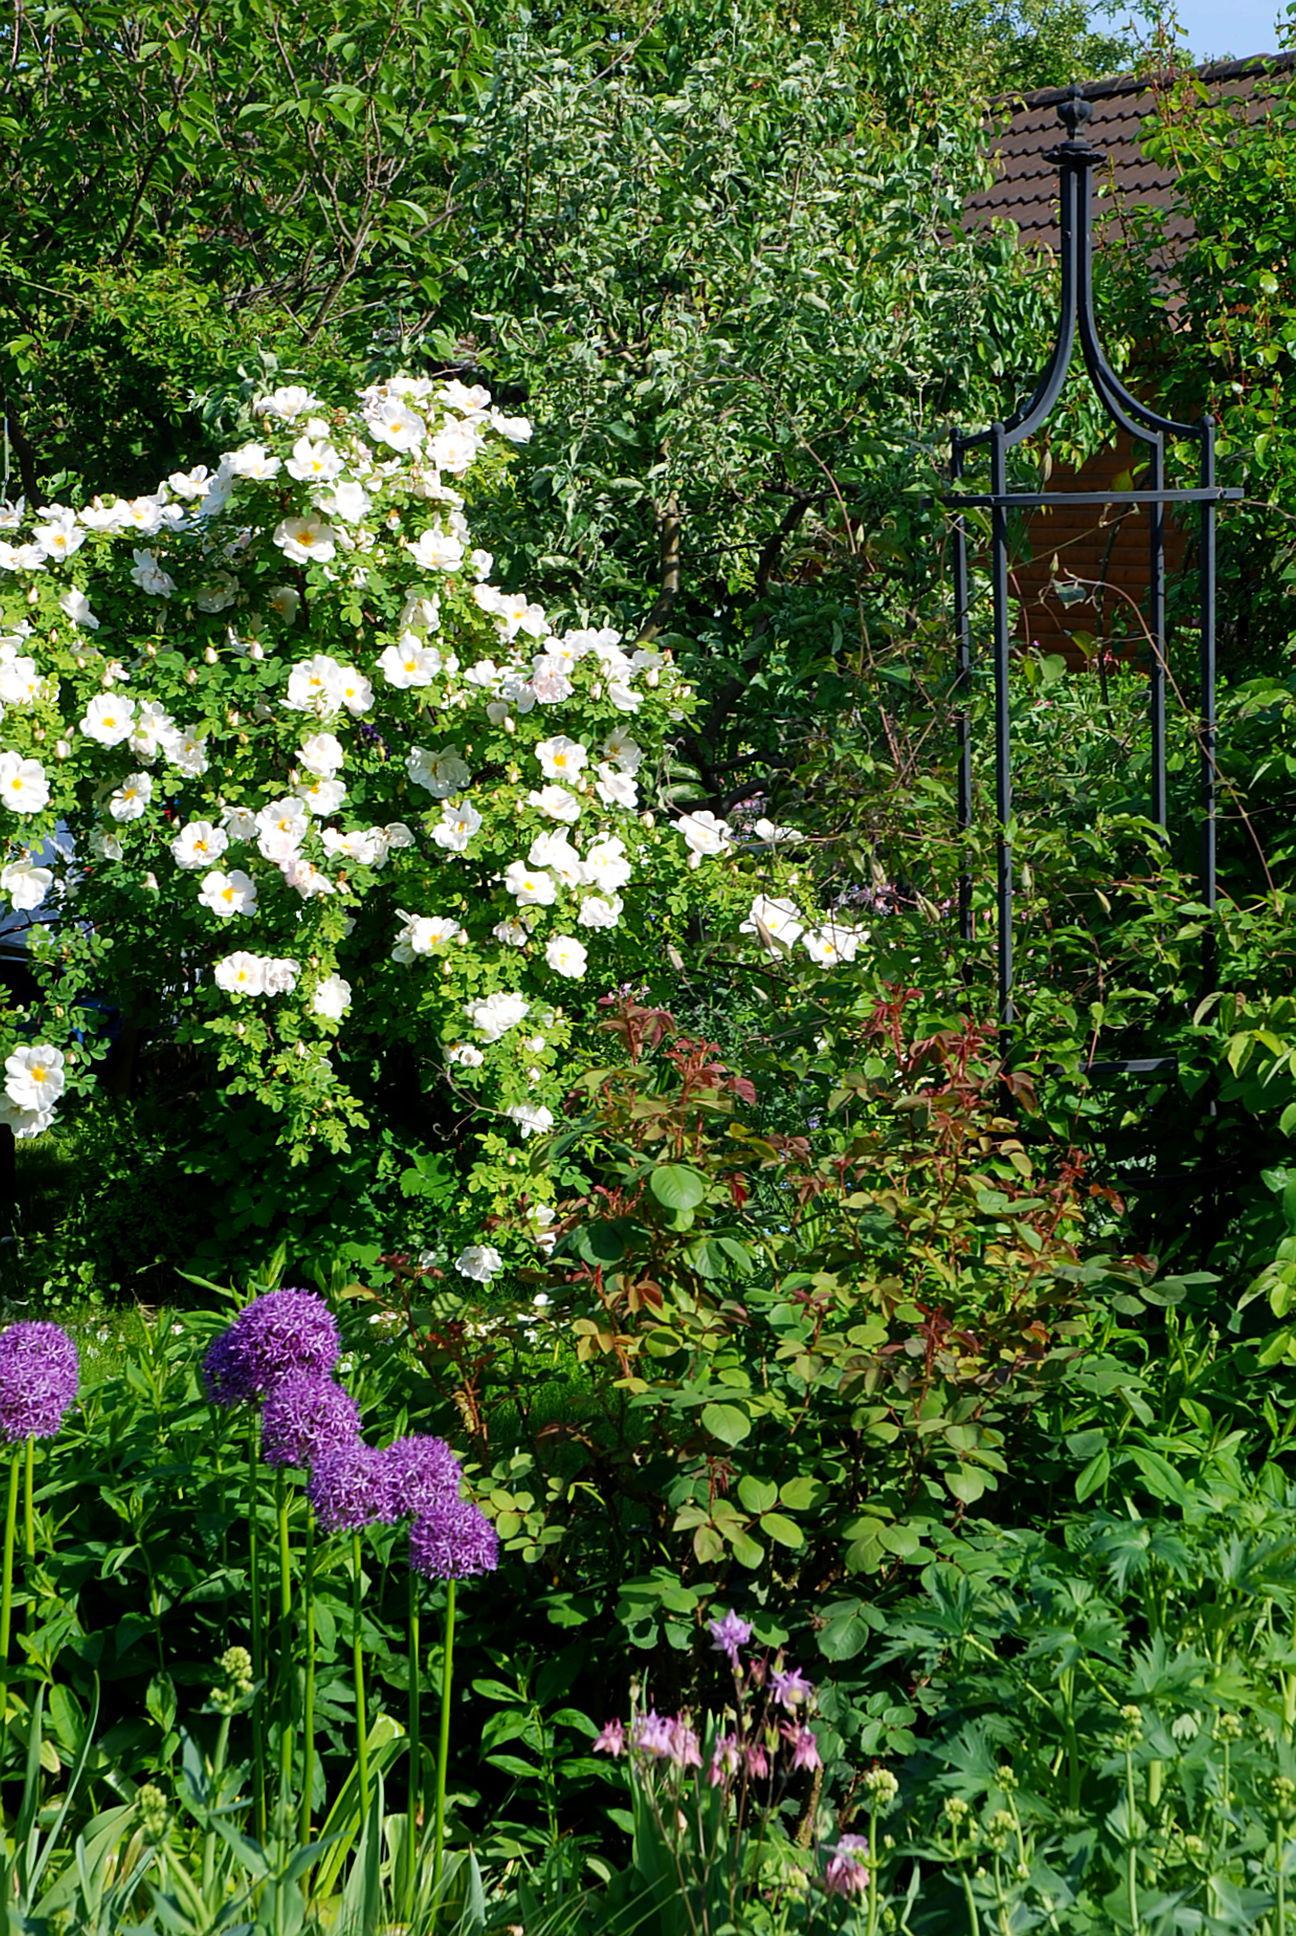 berlingartens Maigarten bei Mein schöner Garten